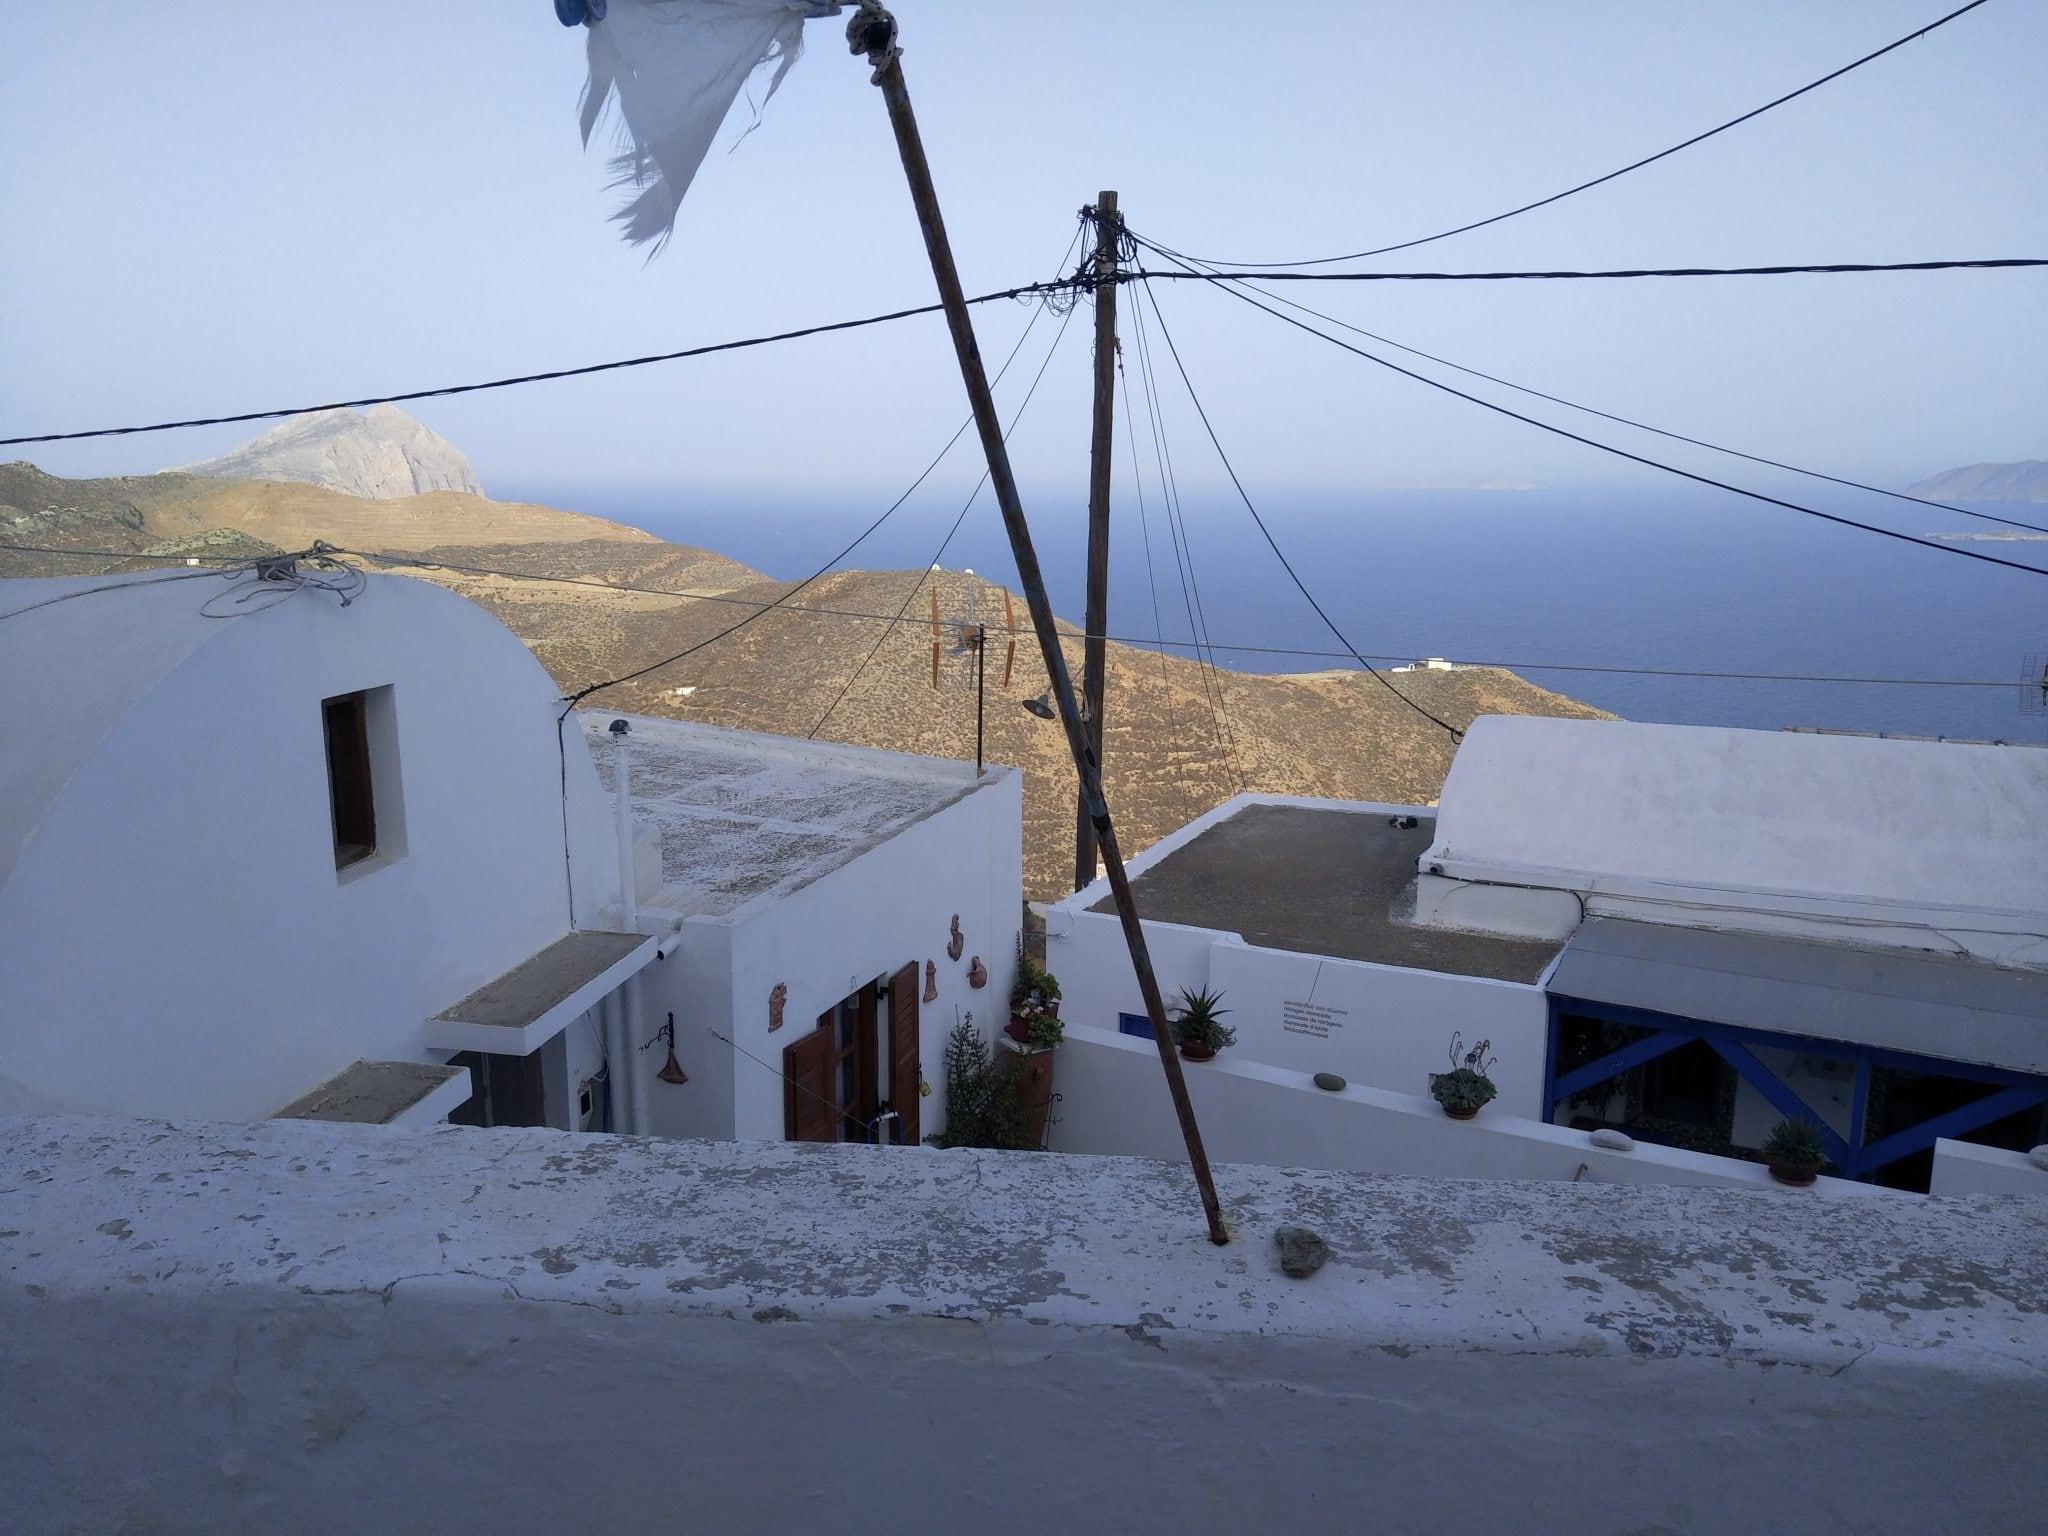 Casa, Anafi - Ref GR-4776